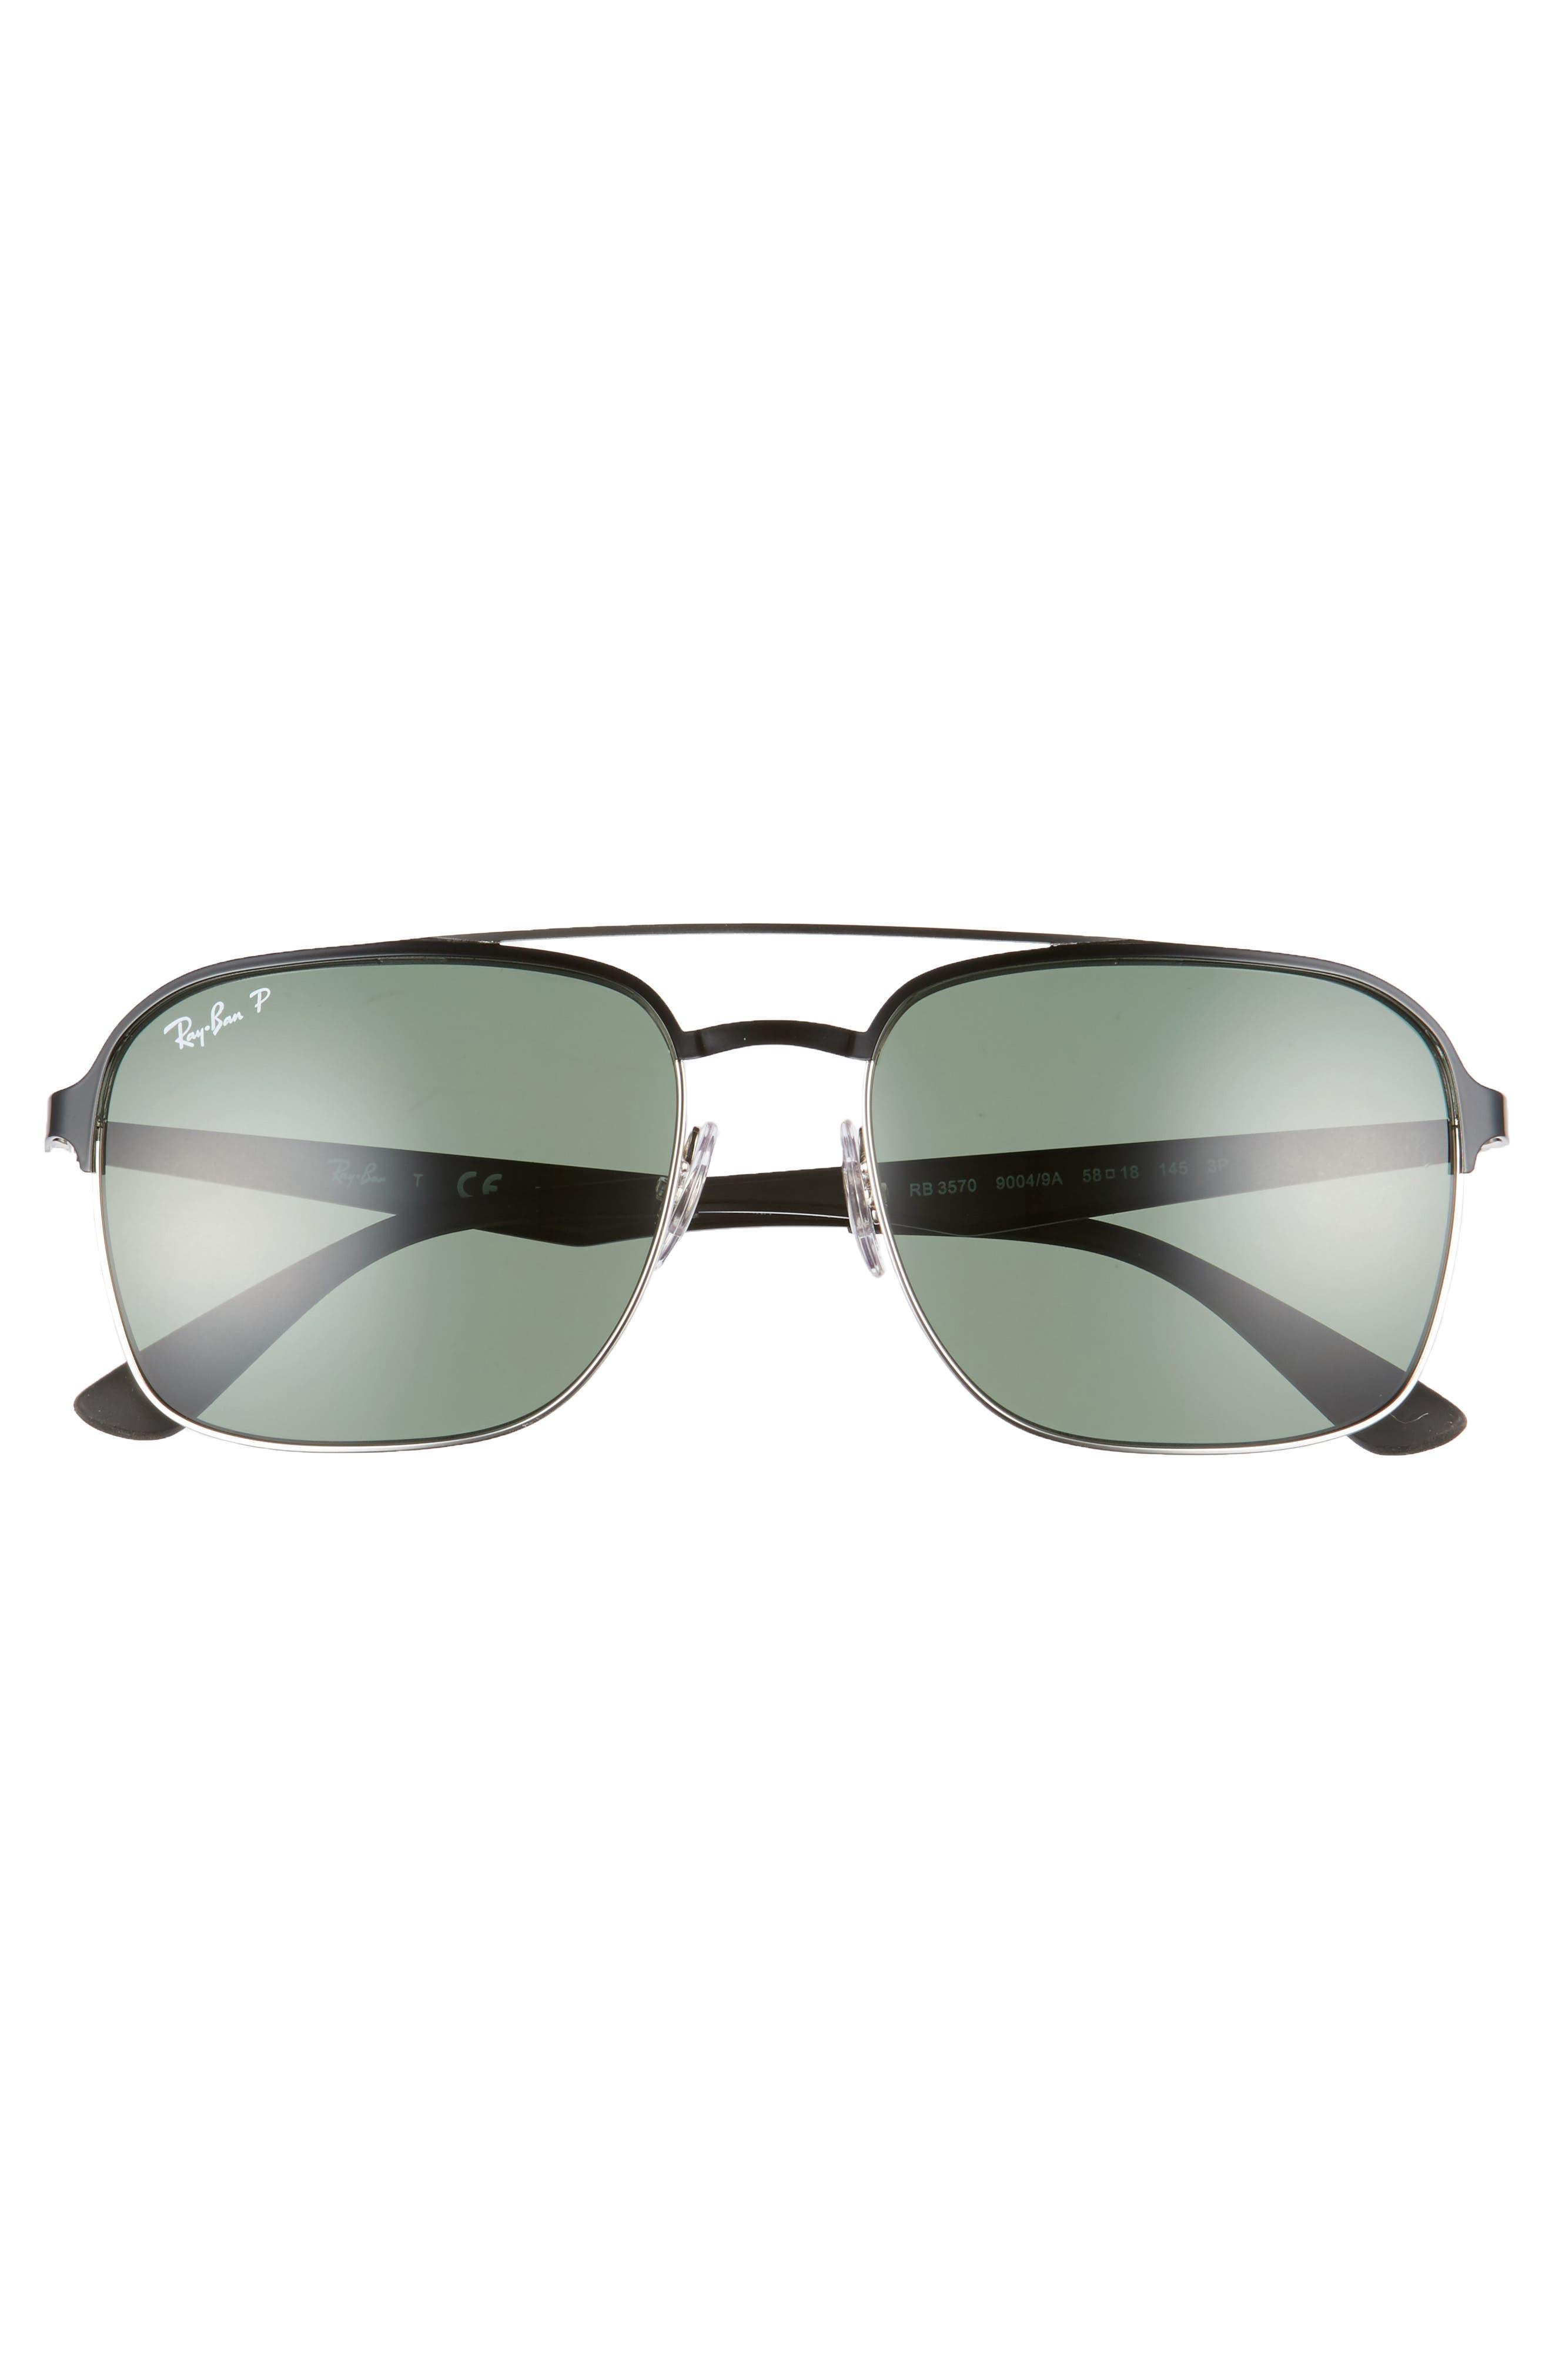 58mm Polarized Sunglasses,                             Alternate thumbnail 2, color,                             BLACK SILVER